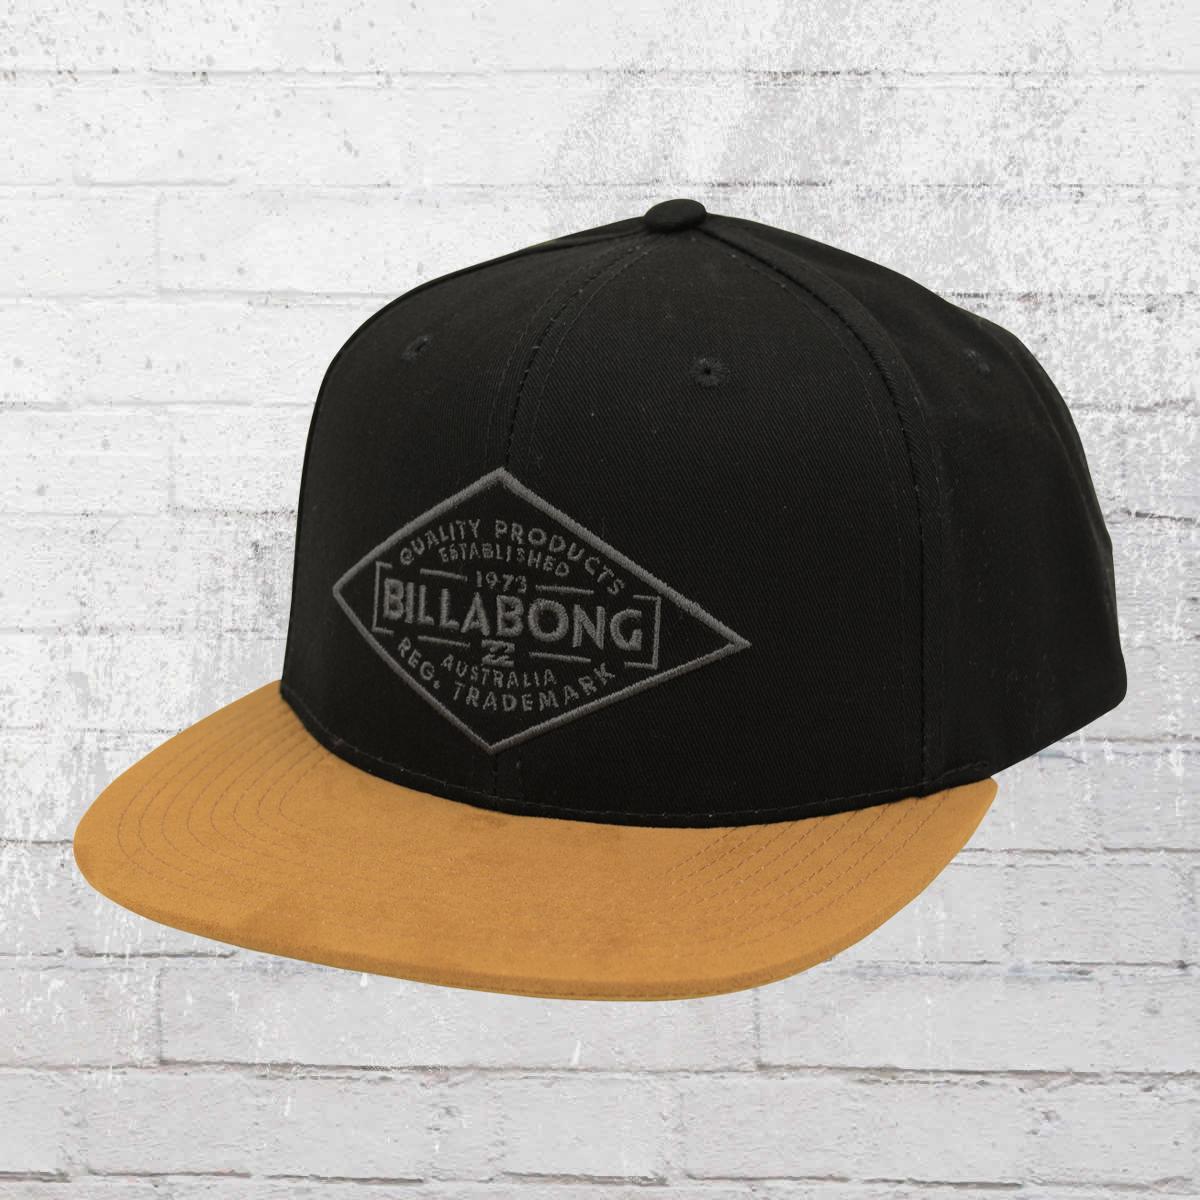 fe8505b5b90d71 ... wholesale billabong hat sama snapback cap black brown. u203au2039 6ee30  50dce